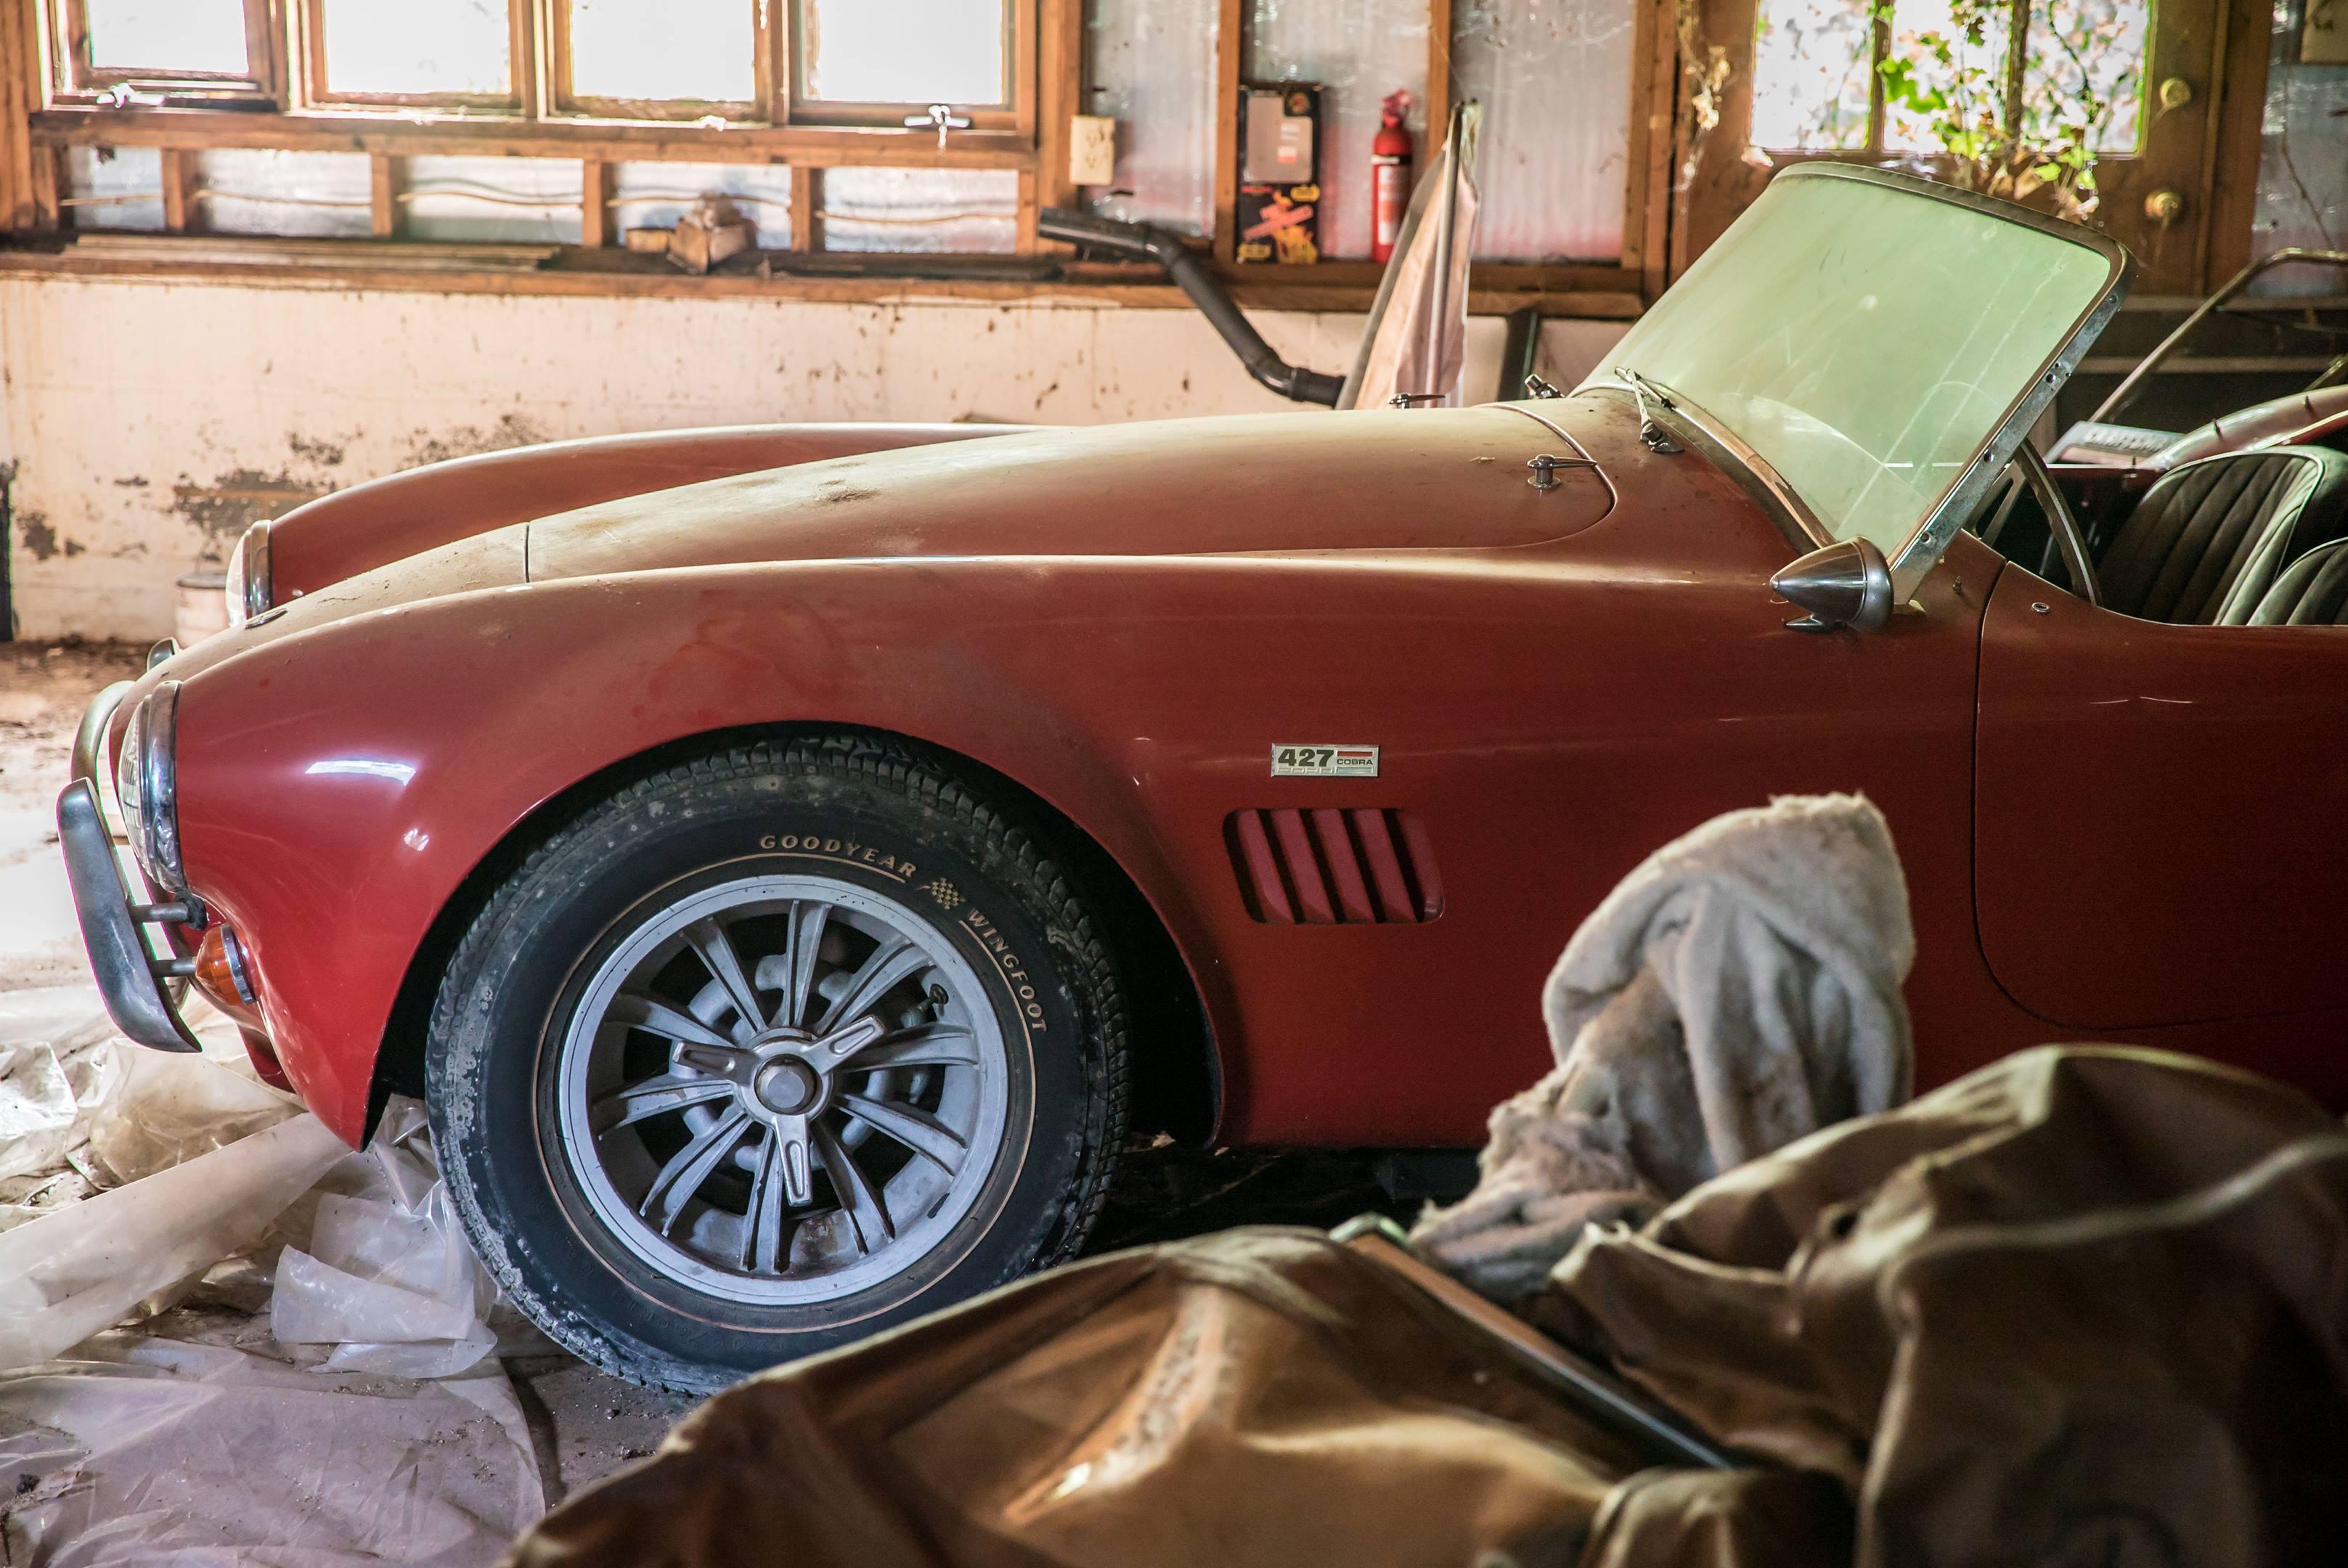 427 Shelby Cobra profile detail